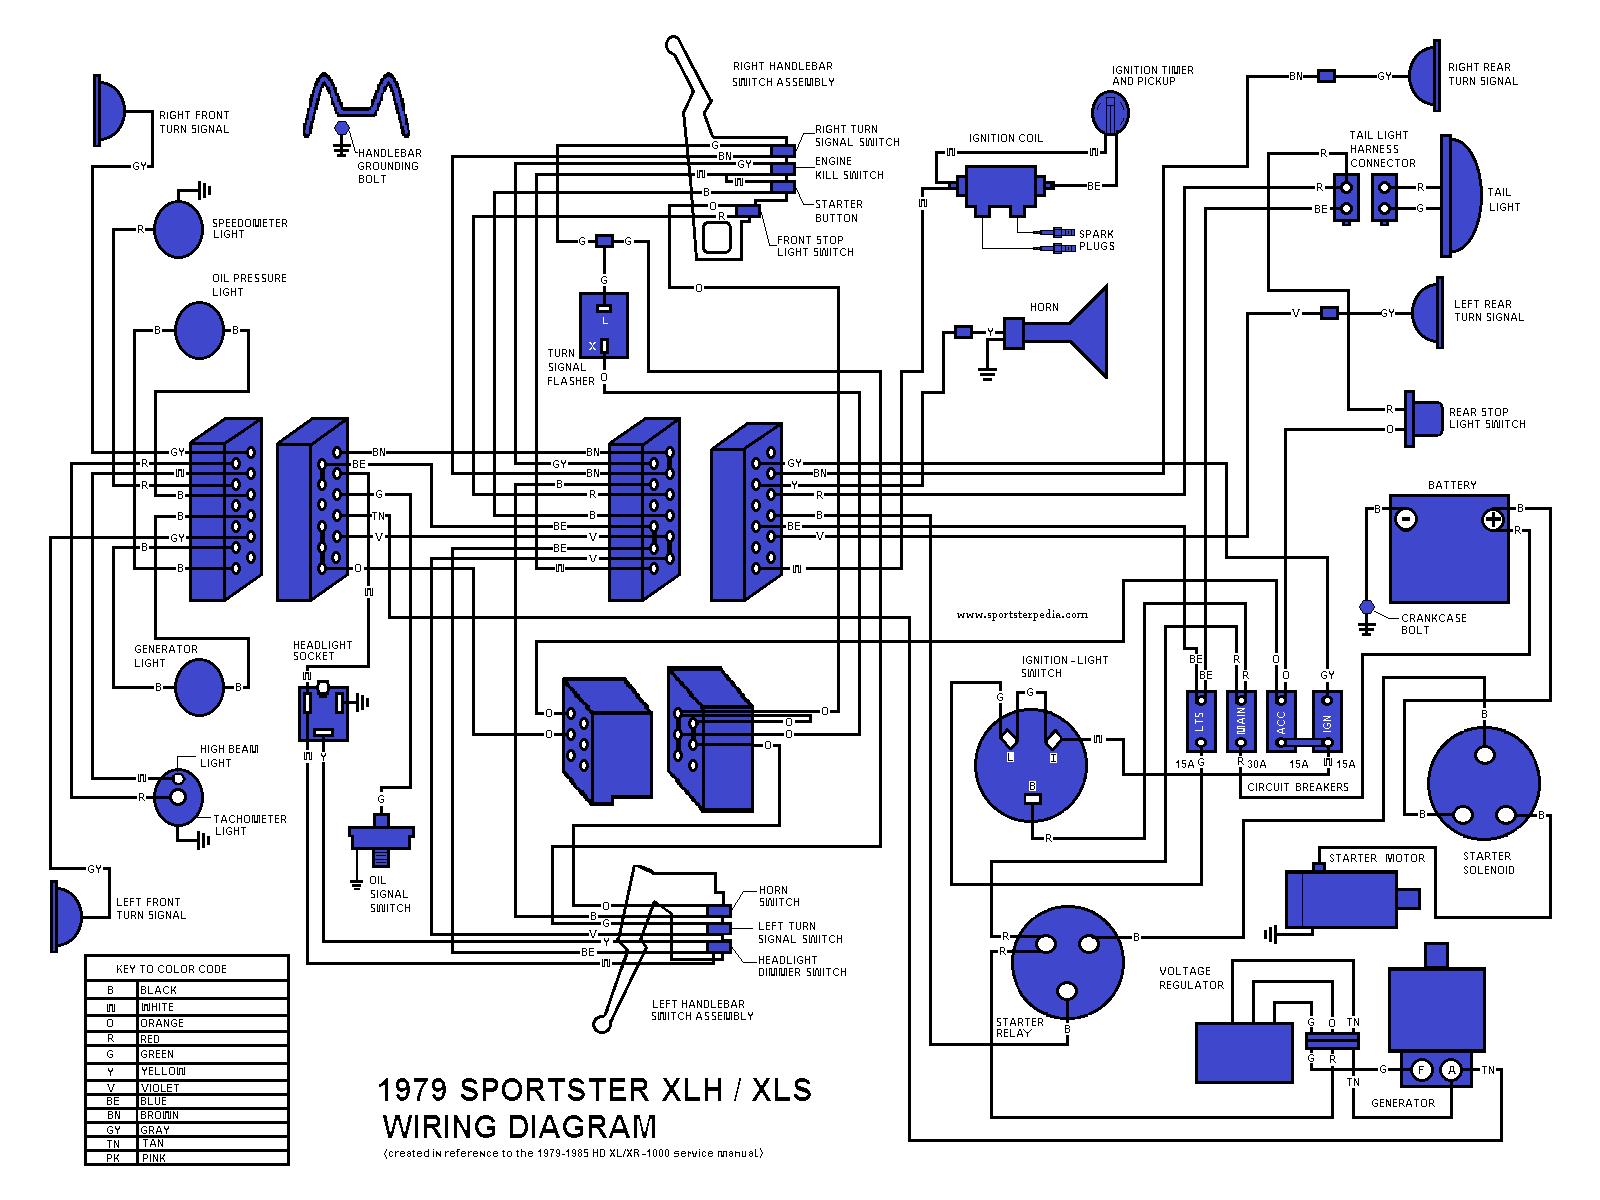 REF: Electrical System - SportsterpediaSportsterpedia